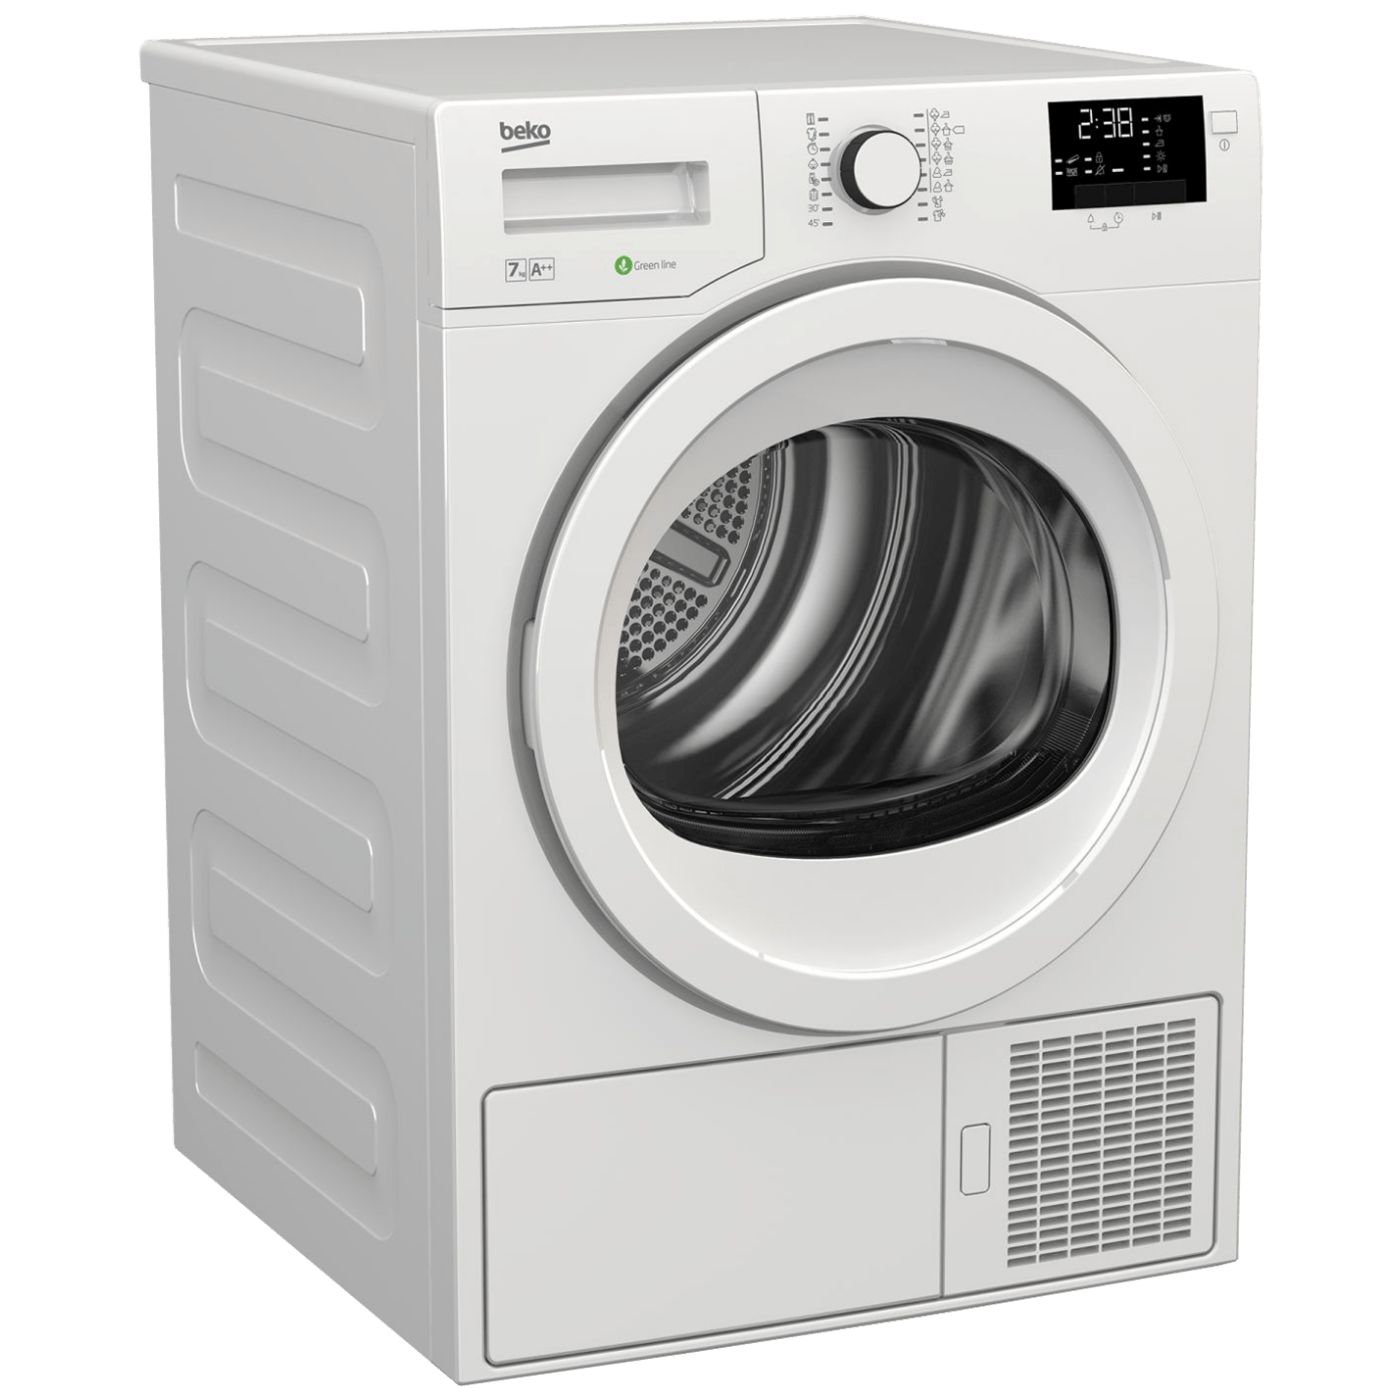 Beko - DPS 7405 GB5